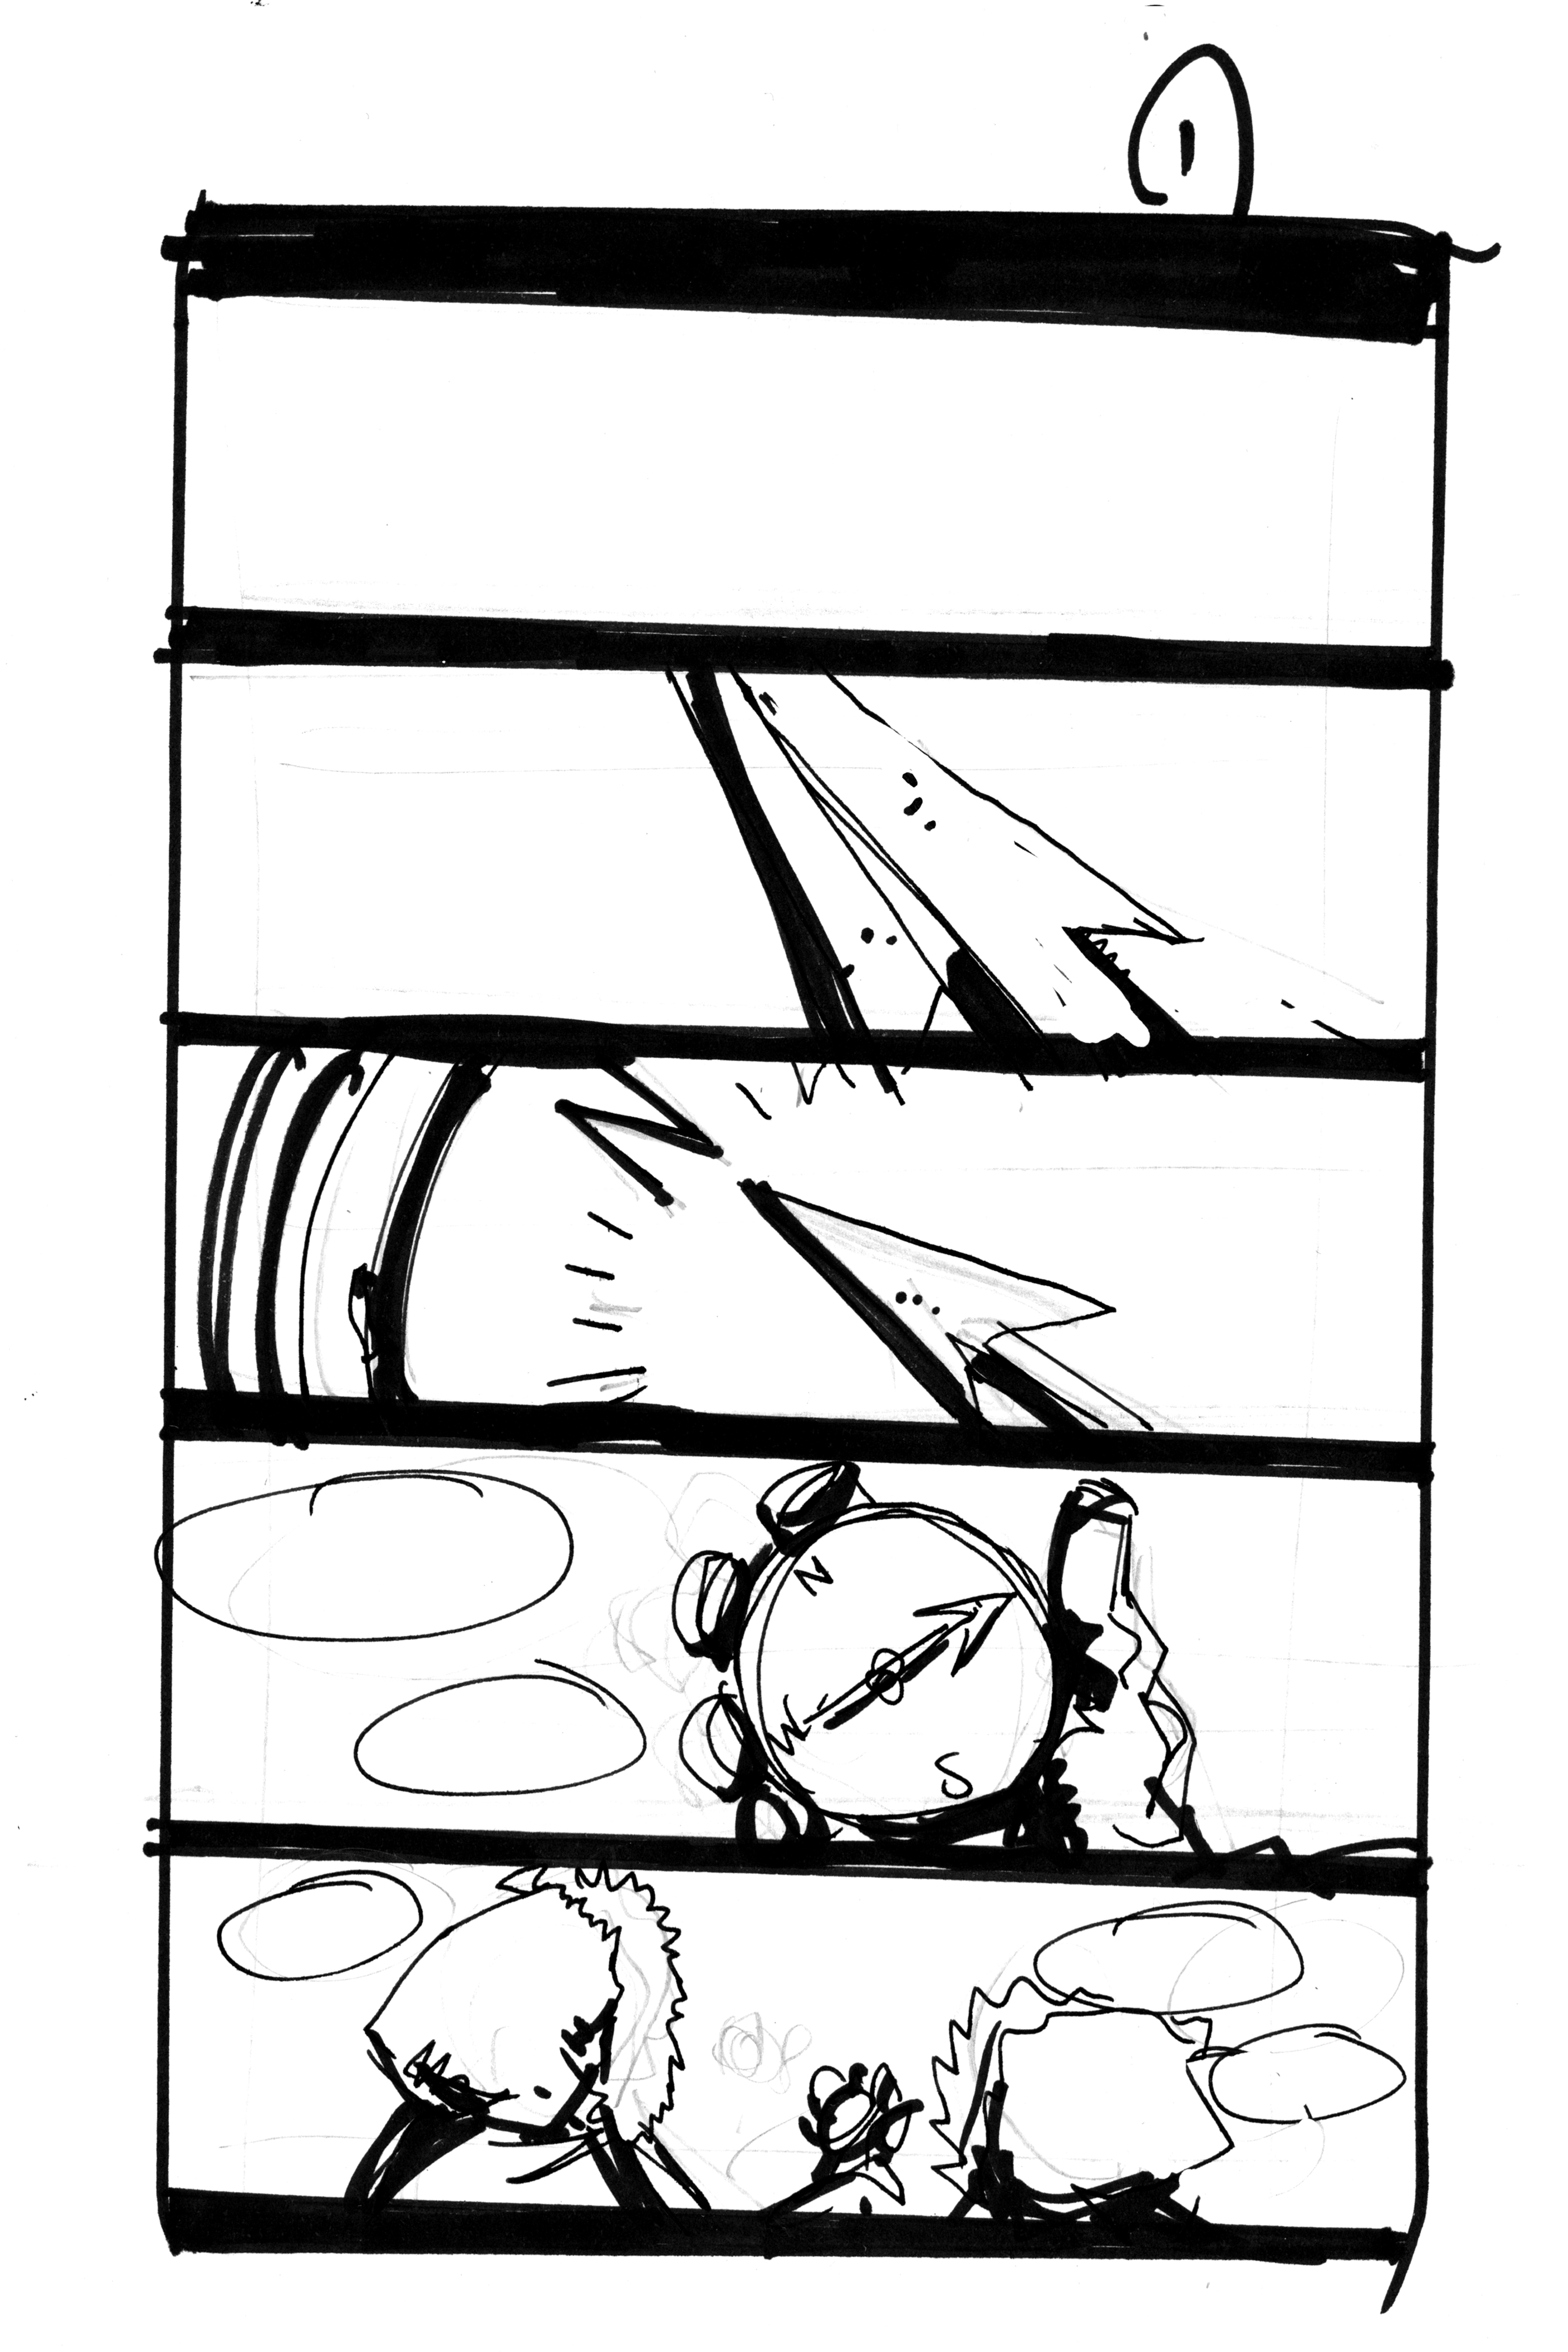 http://www.urban-comics.com/wp-content/uploads/2013/10/pp1.jpg